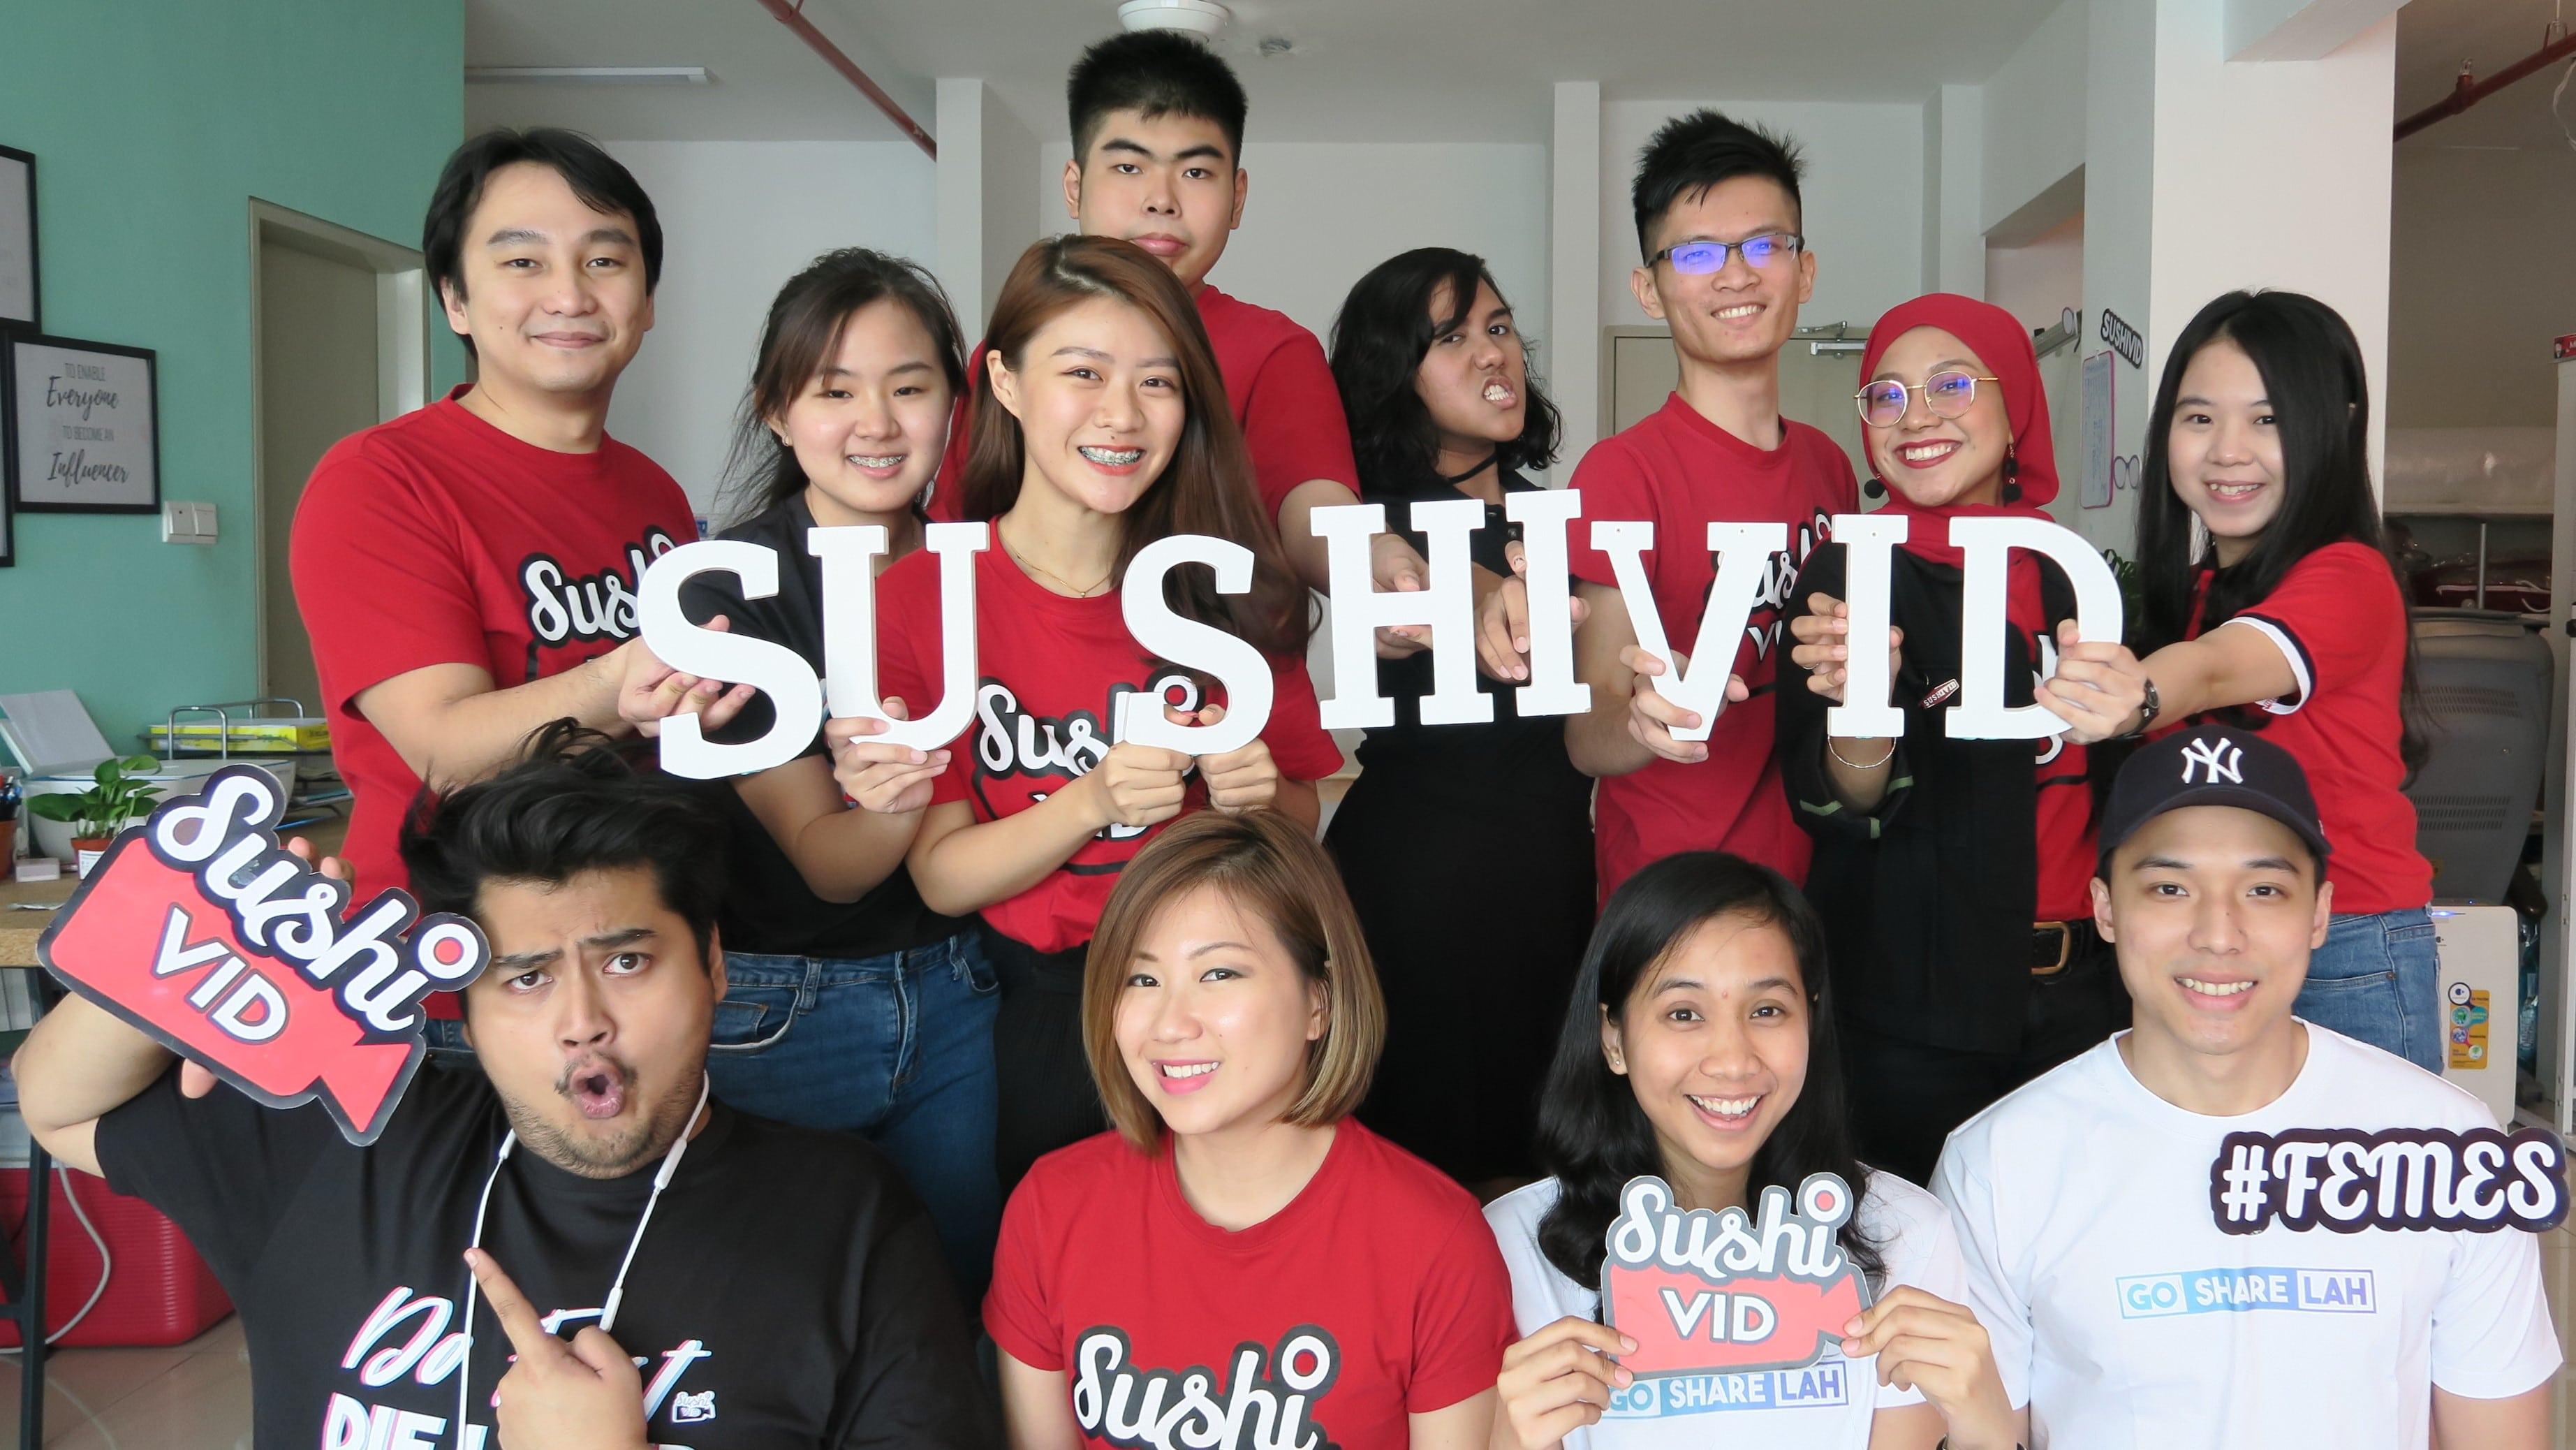 SushiVid Team